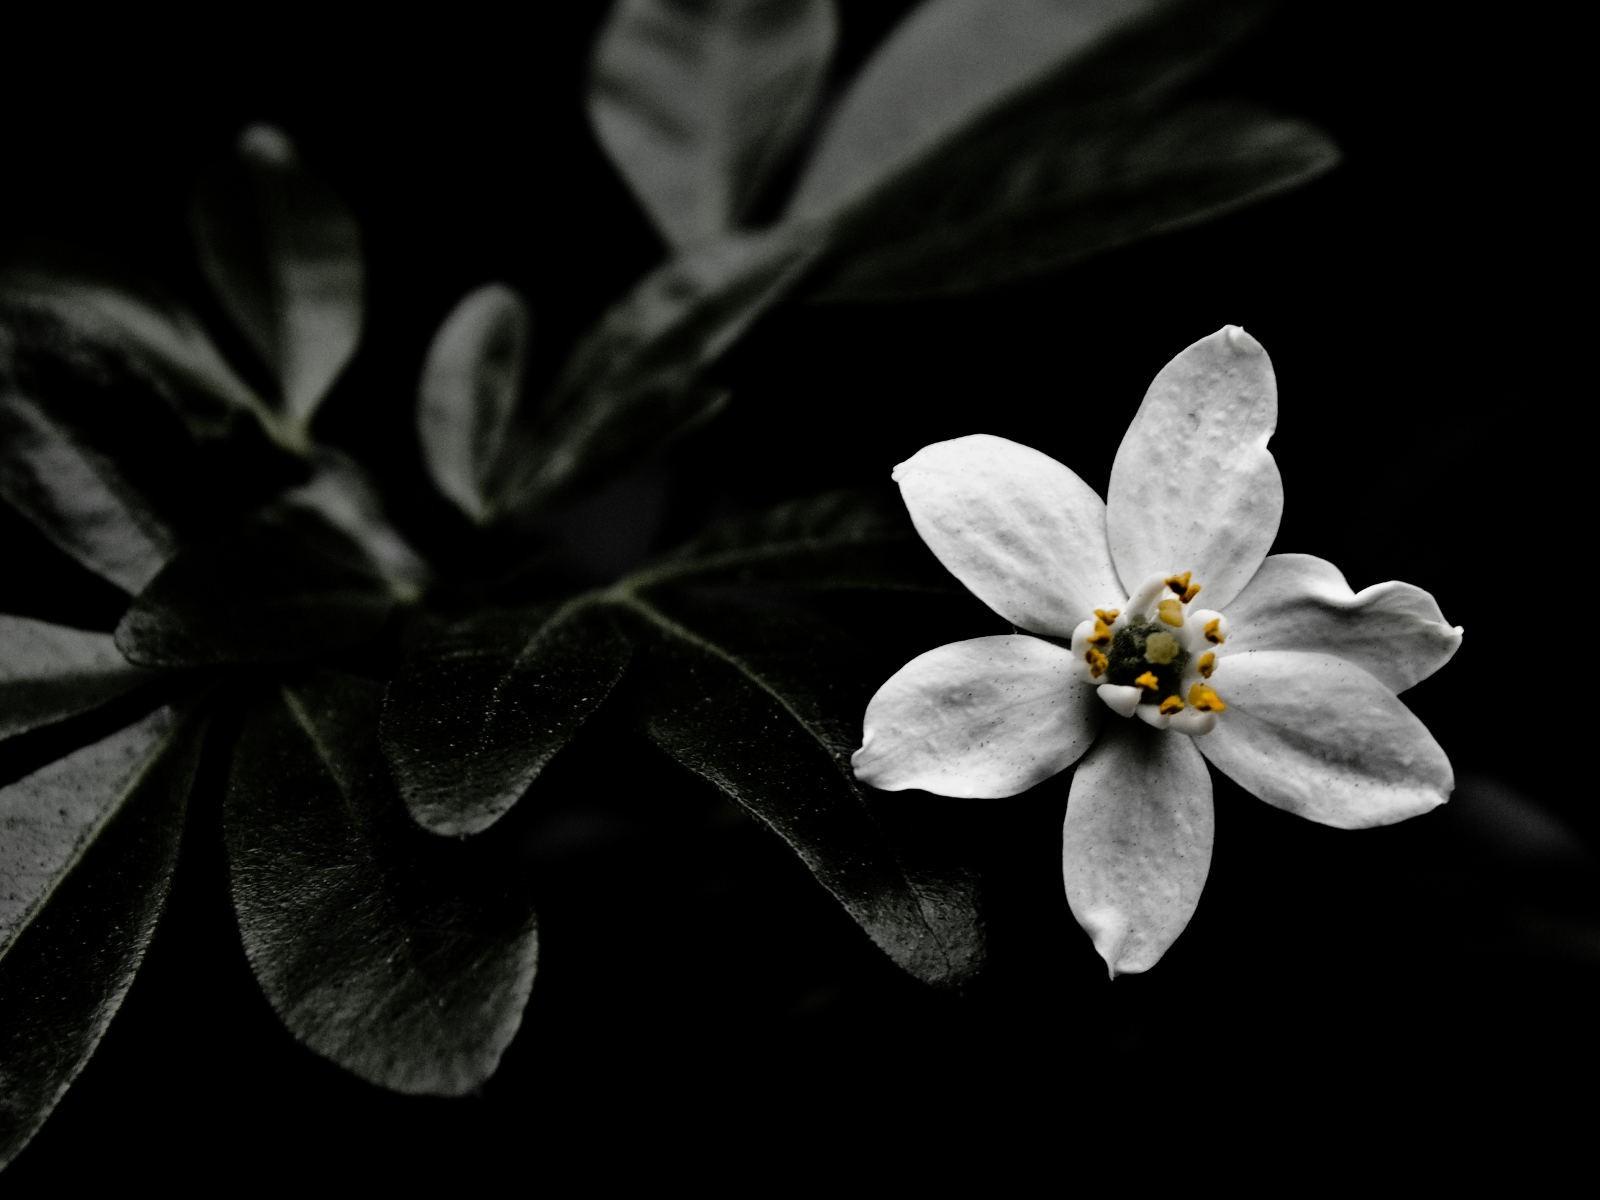 fond d'écran noir et blanc Aperçu | 10wallpaper.com